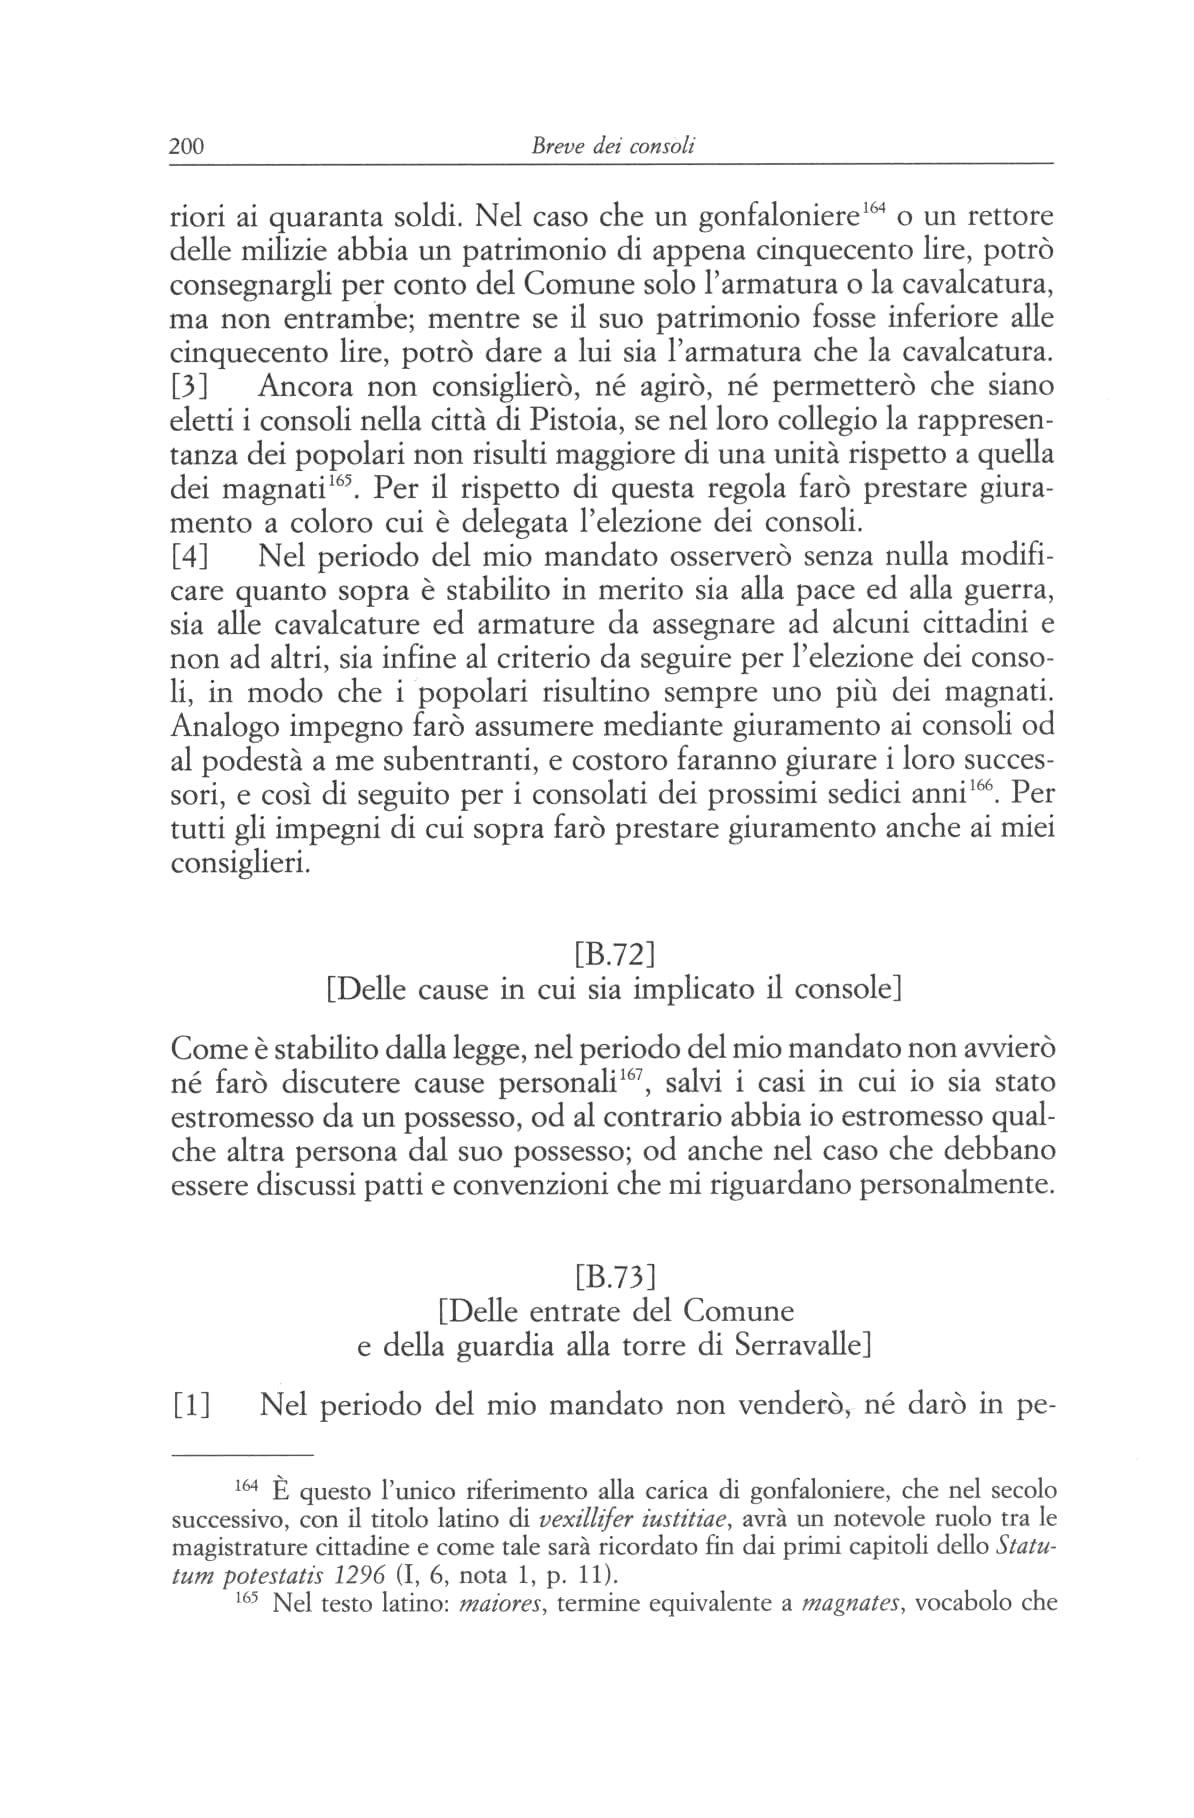 statuti pistoiesi del sec.XII 0200.jpg